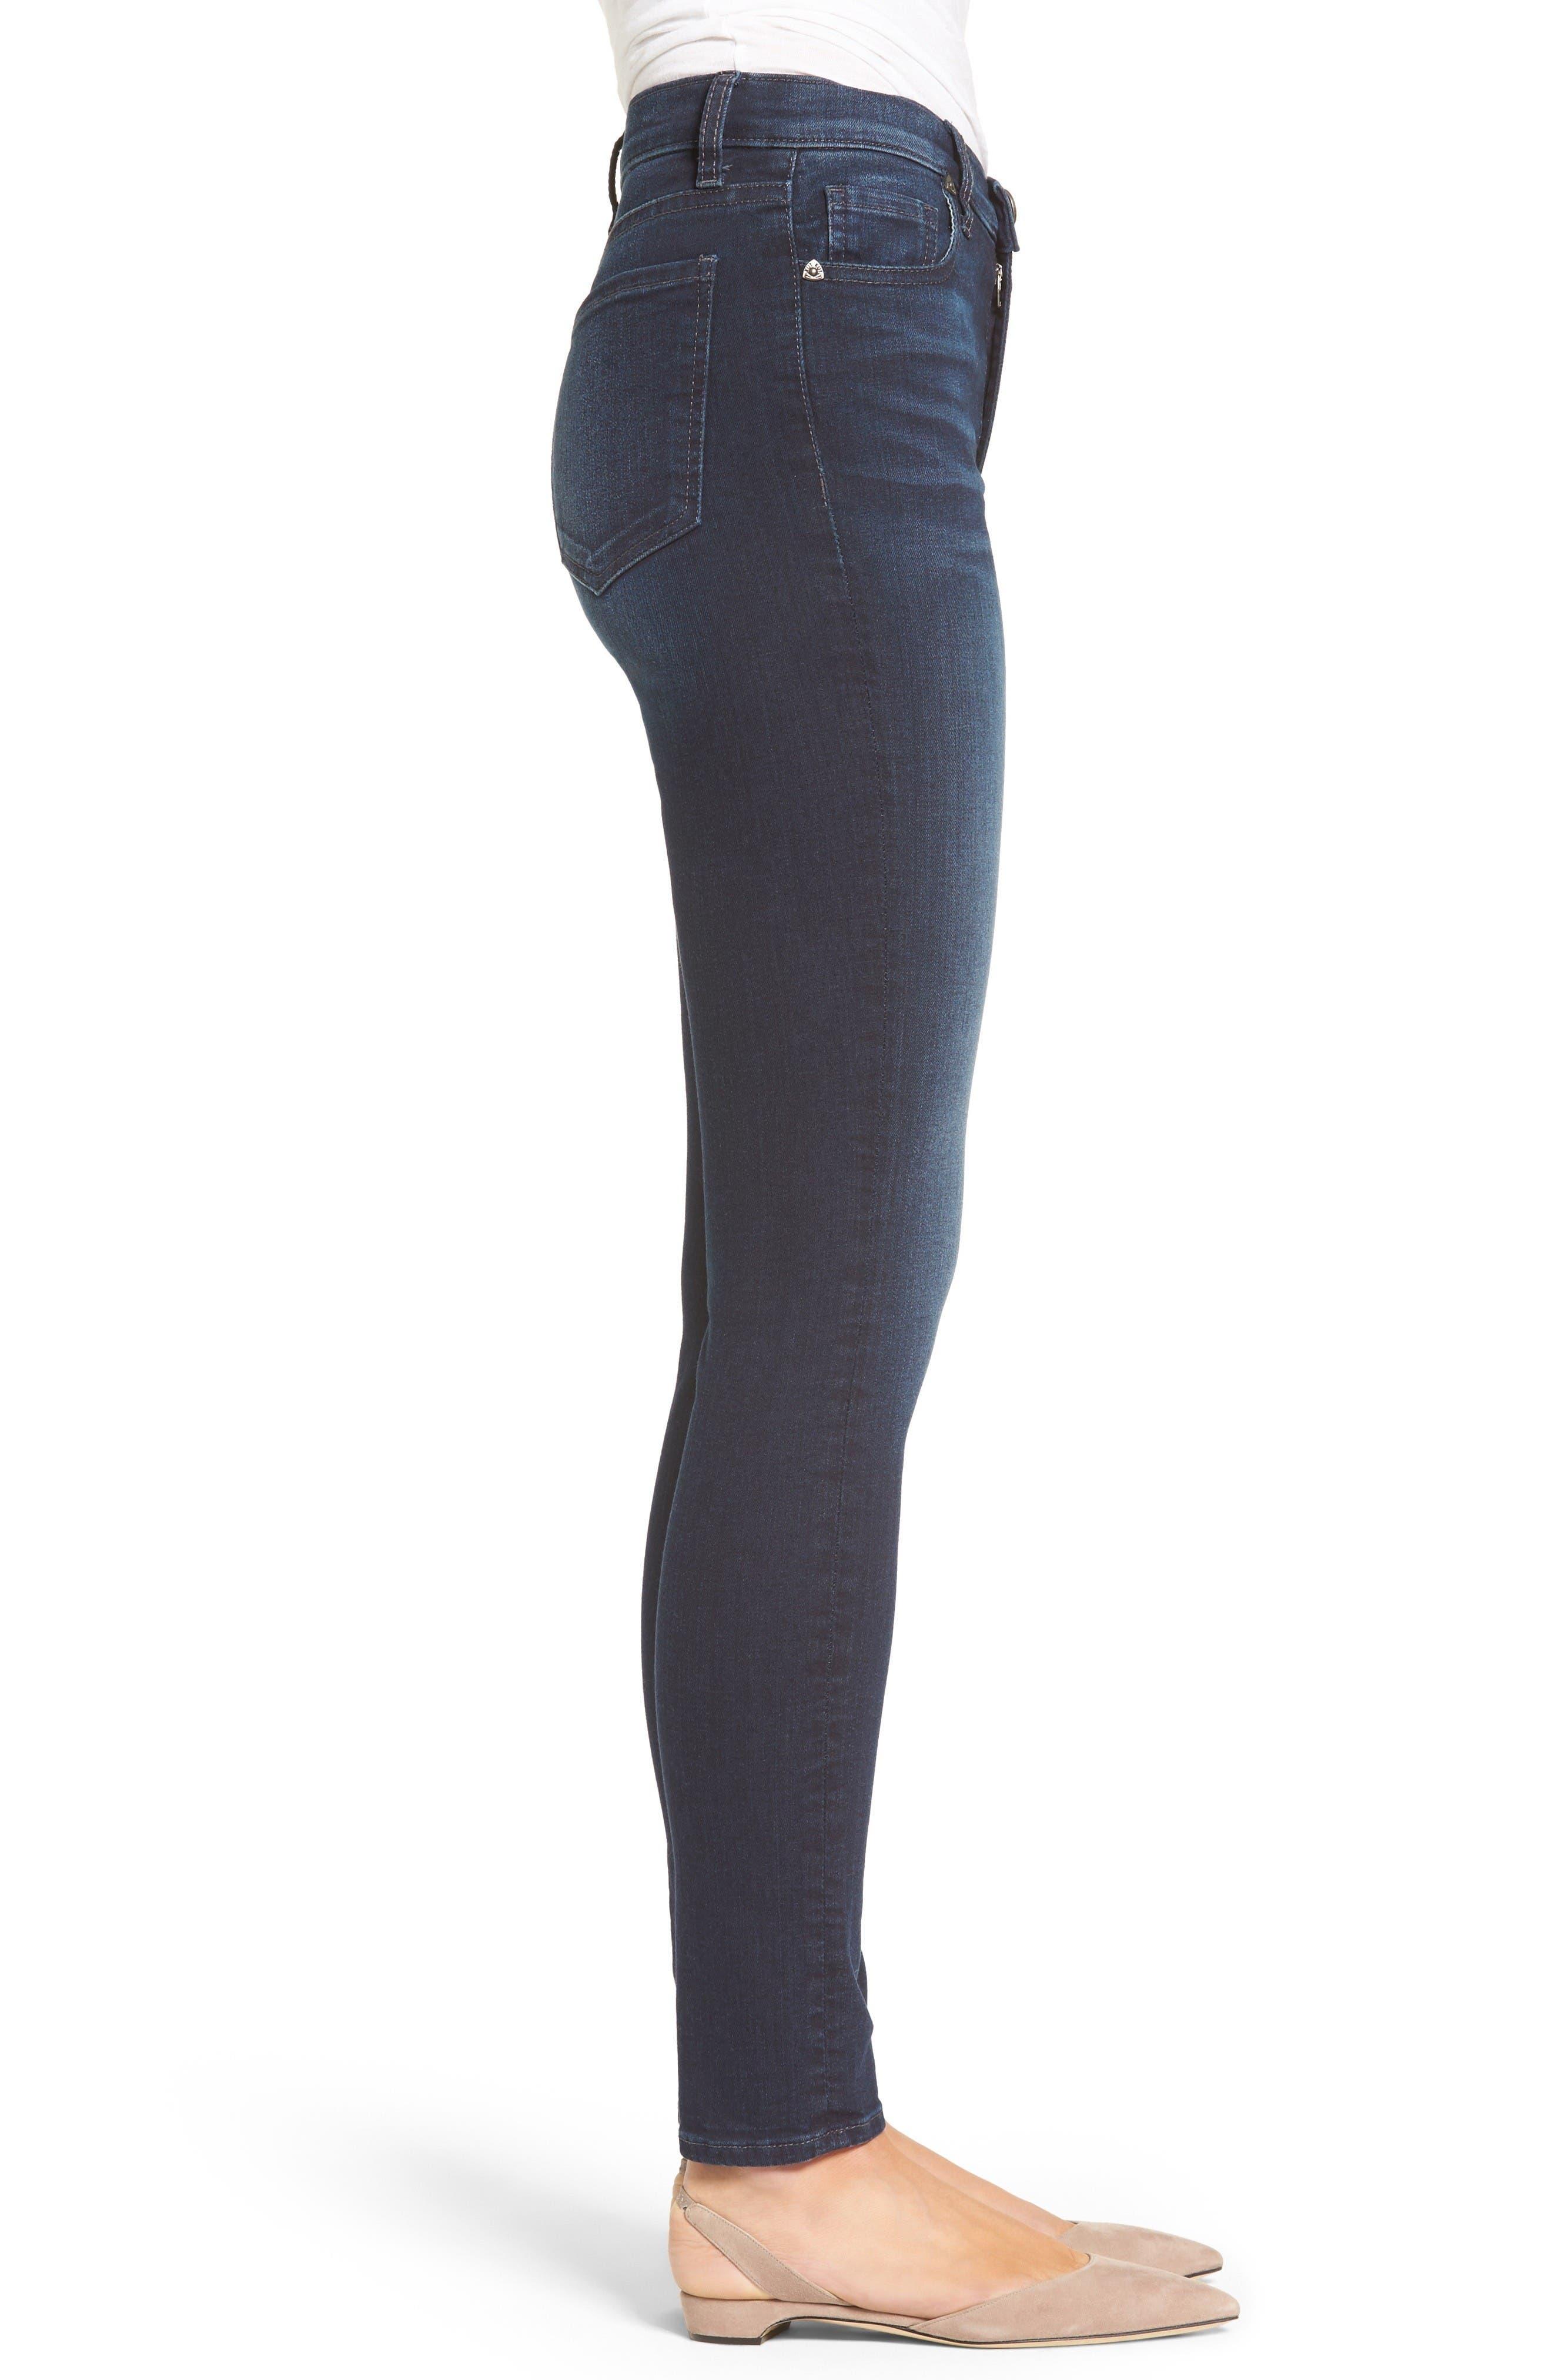 Alternate Image 3  - KUT from the Kloth Mia High Waist Skinny Jeans (Regular & Petite) (Pacable)